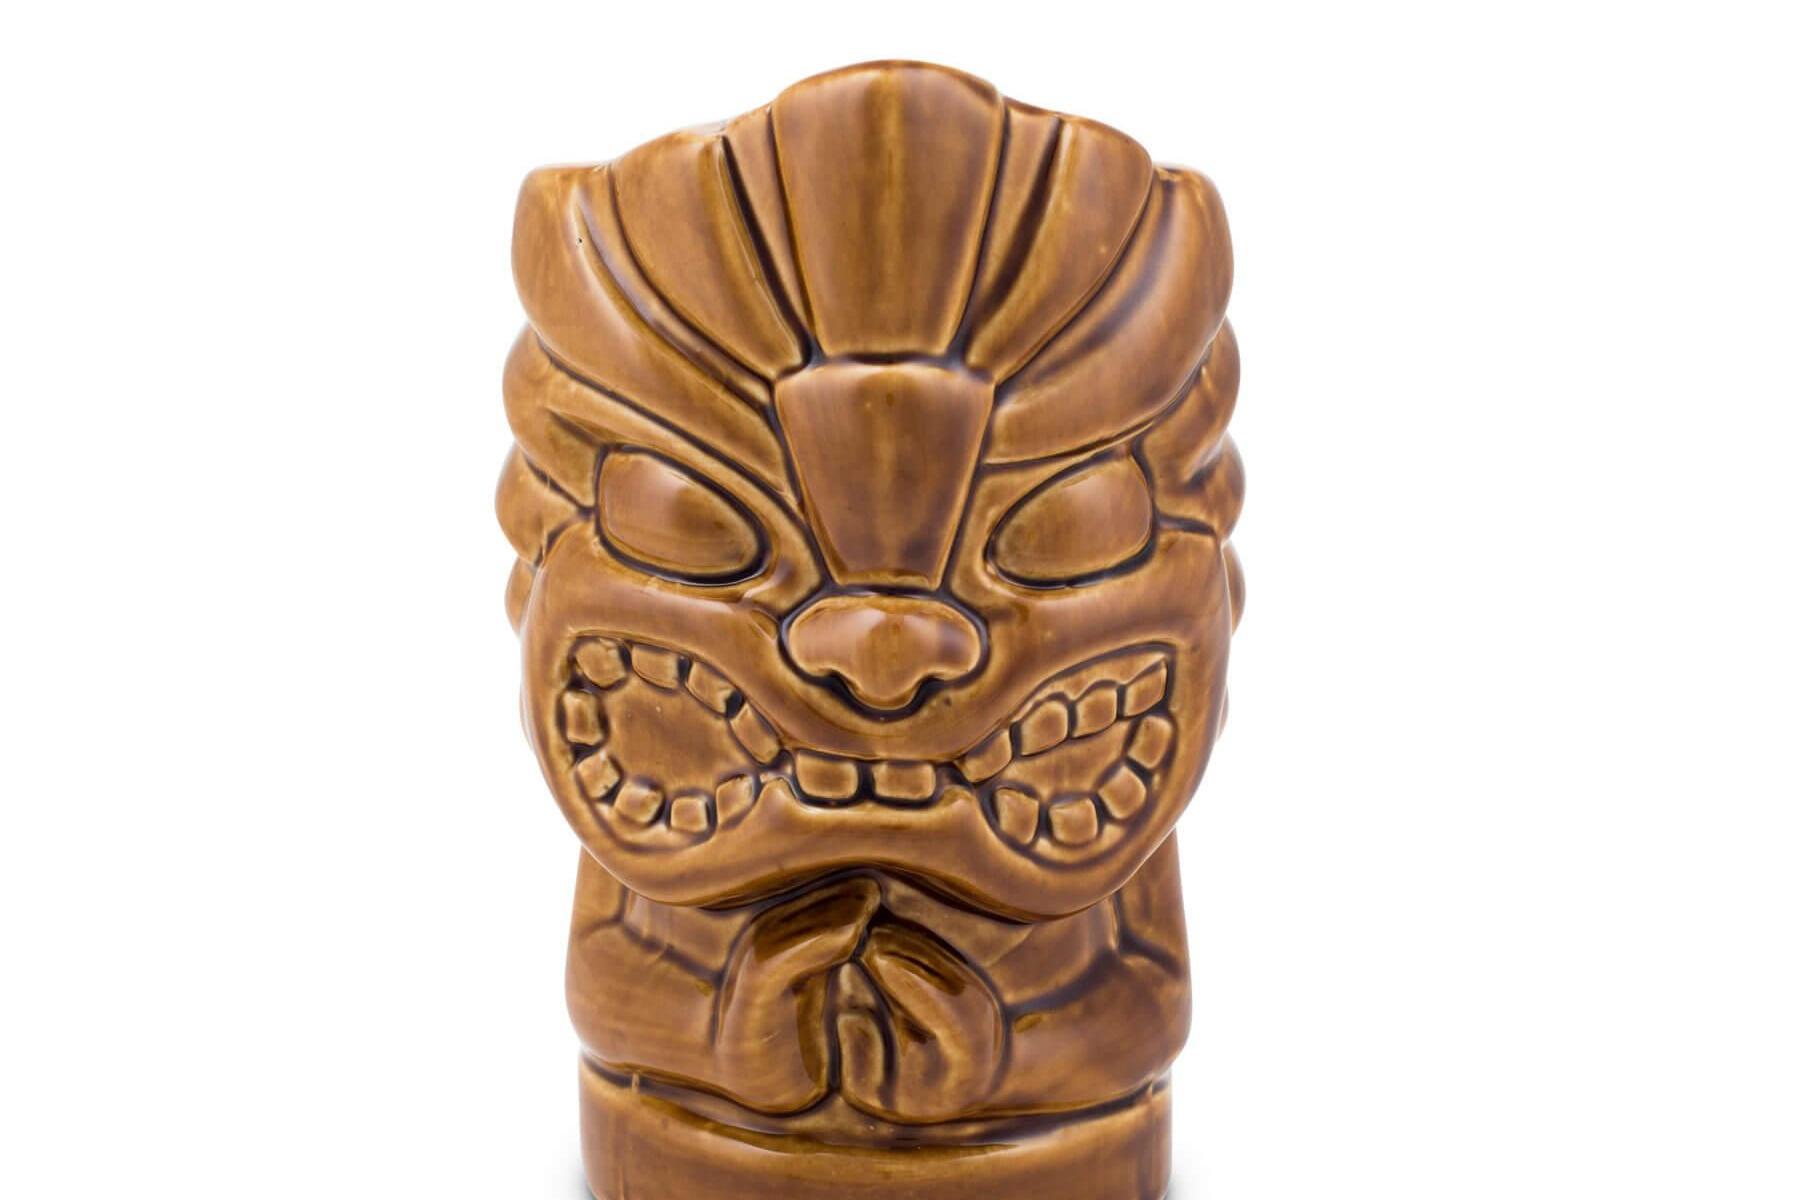 Kanaloa Tiki God Ceramic Cocktail Mug (850 ml) Fifth & Vermouth Front View